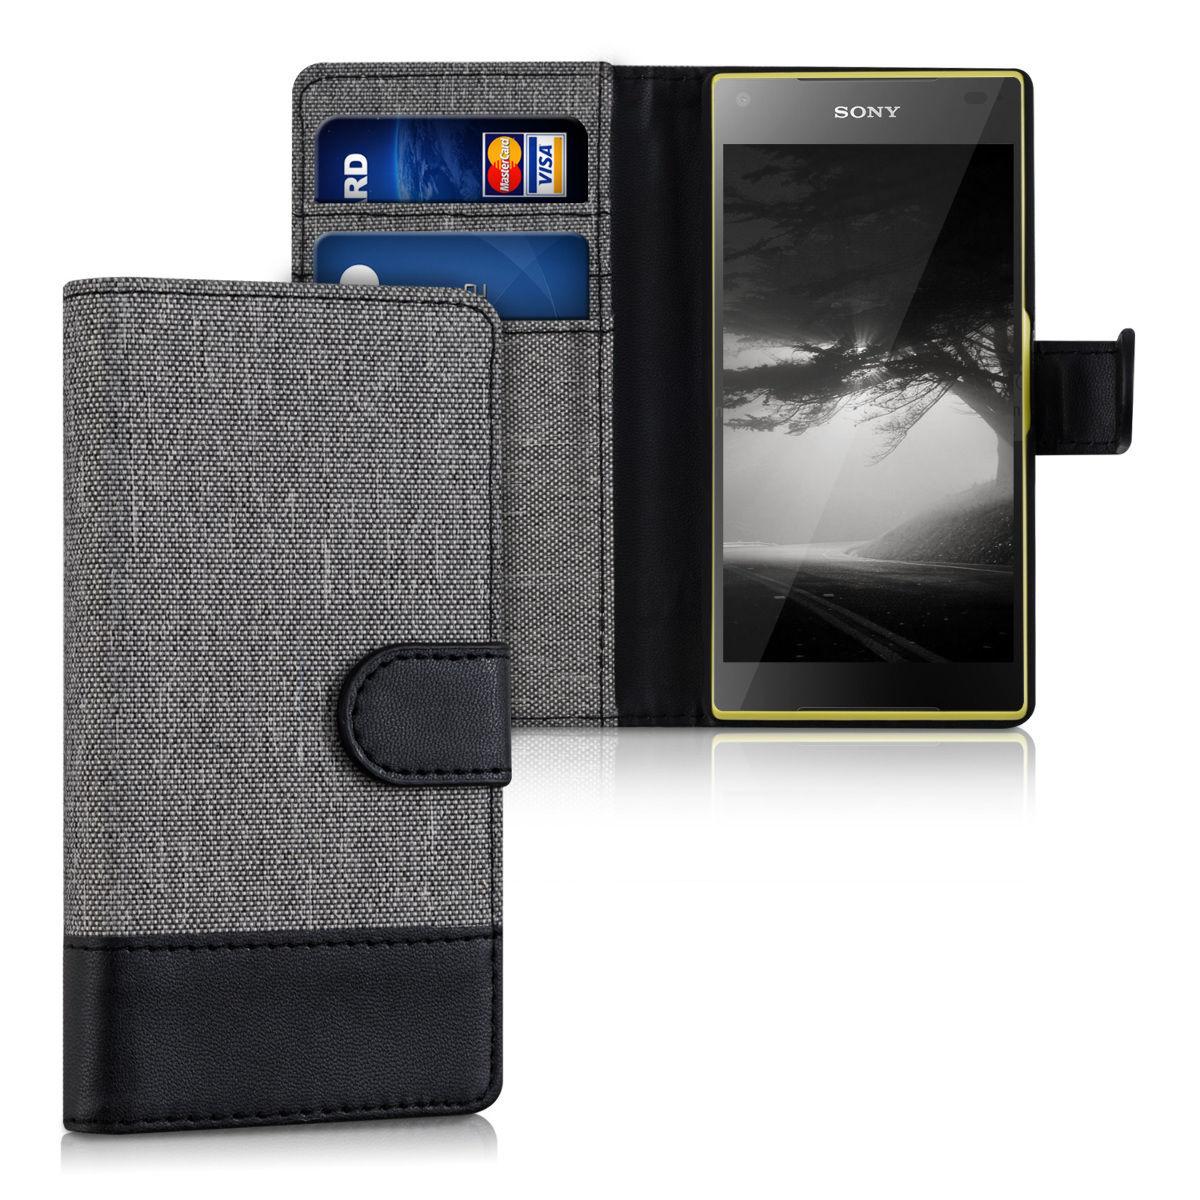 Pouzdro pro Sony Xperia Z5 Compact šedé